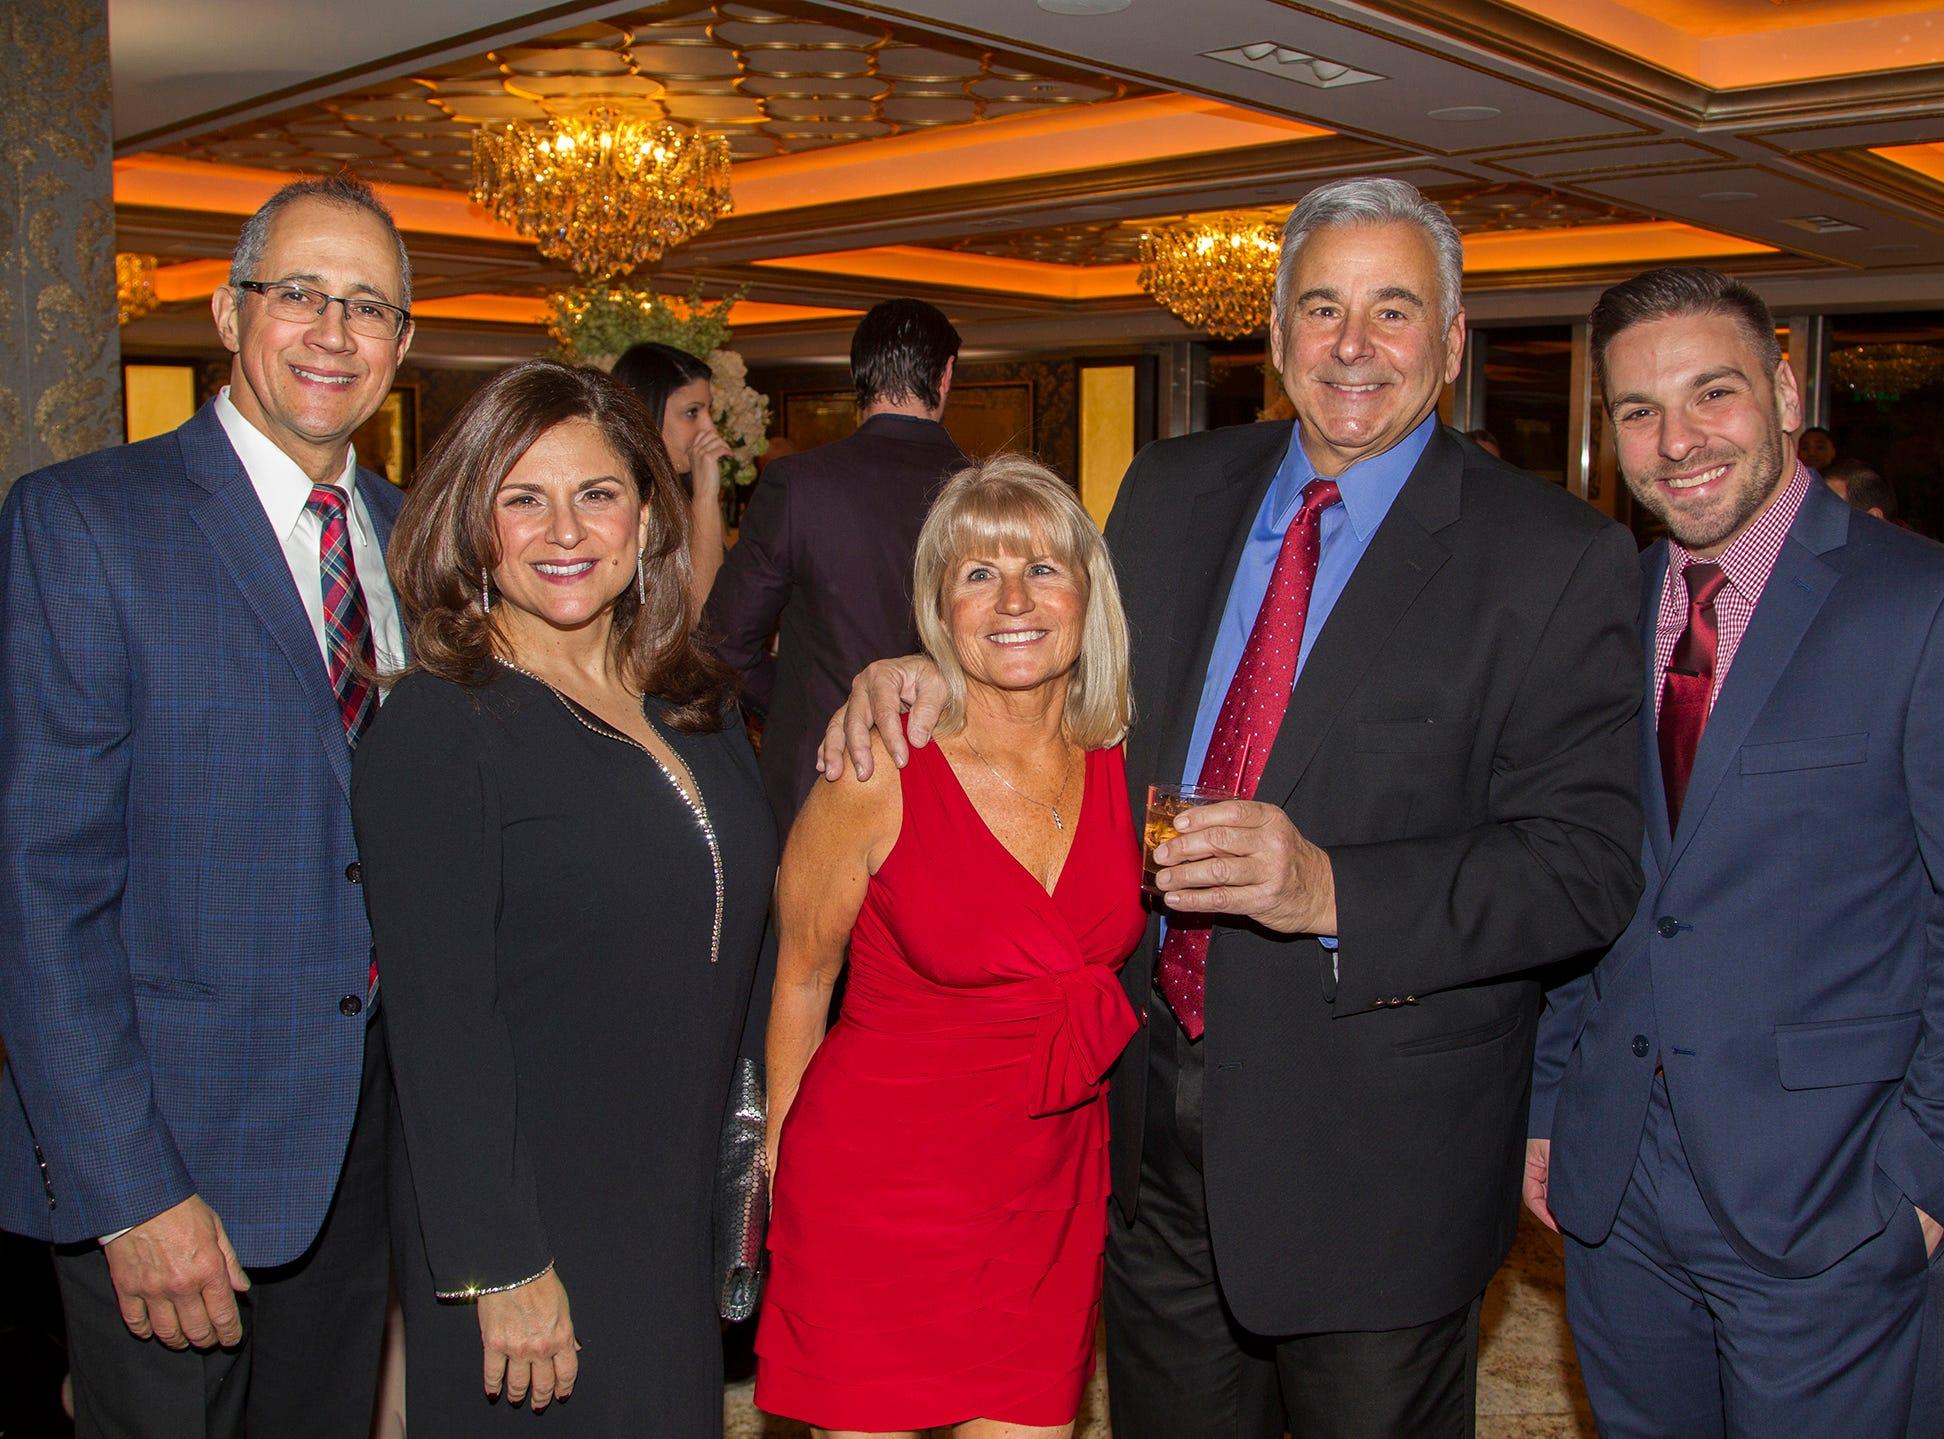 Julio Periera, Annmarie Pereira, Diane Lento, Frank Lenta, Dr .Eric Rozenblat. Institute for Educational Achievement (IEA) held its annual Dinner Dance at Seasons in Washington Township. 02/02/2019